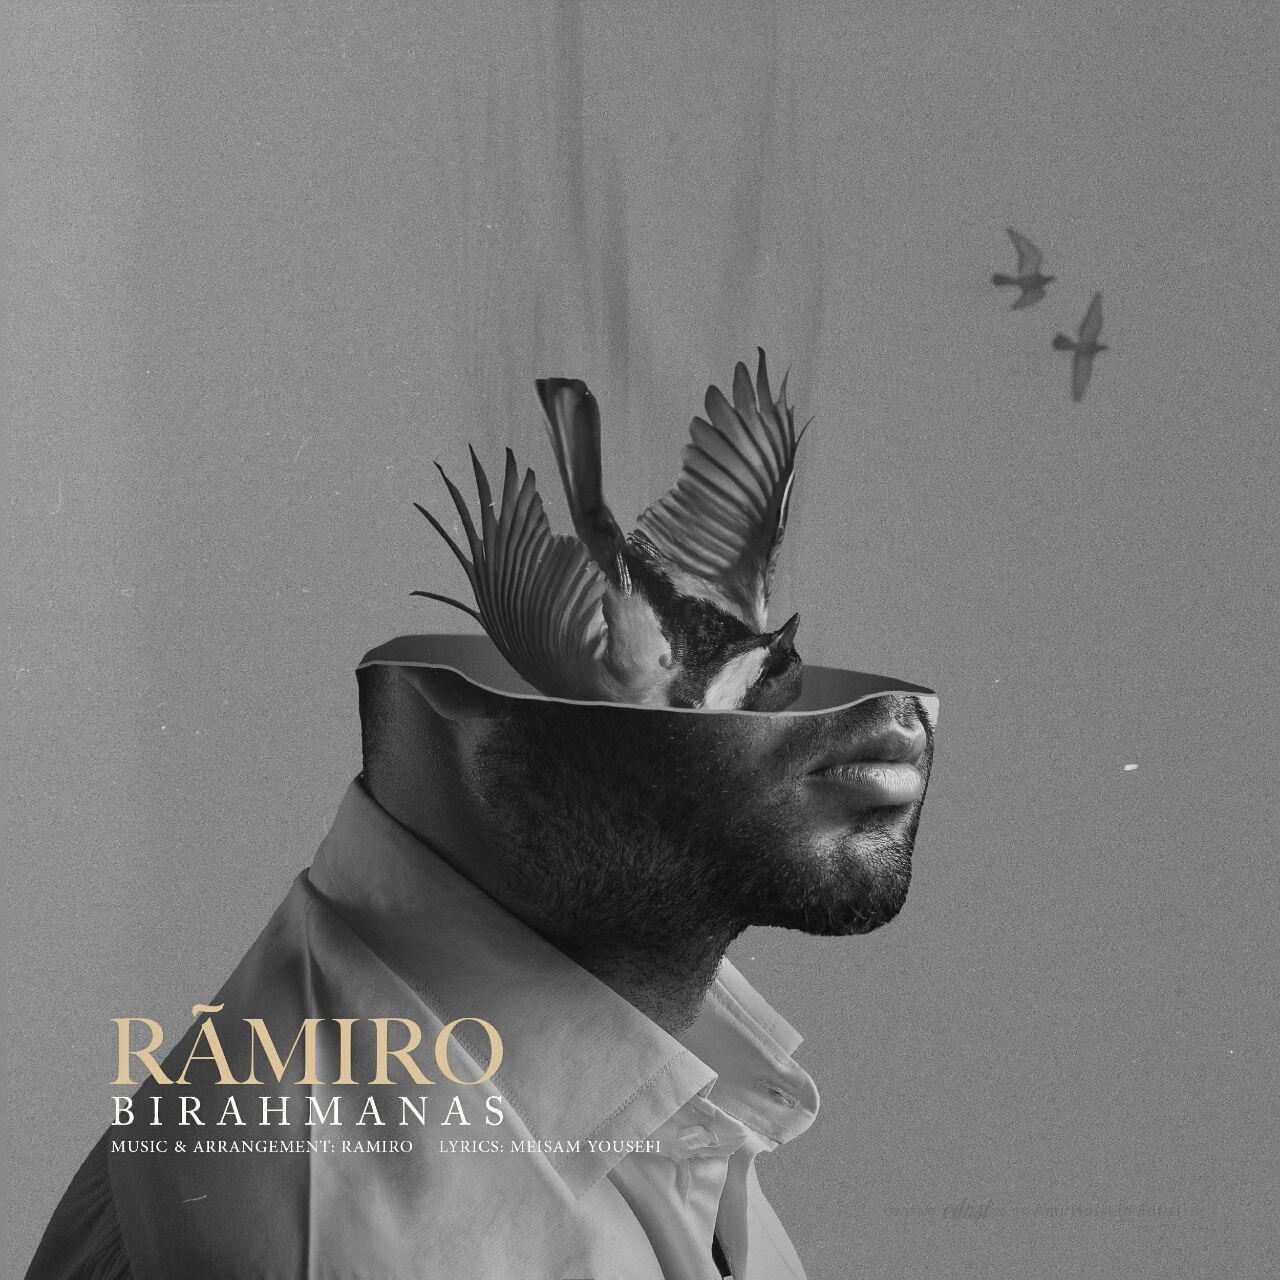 رامیرو به نام بی رحمانس